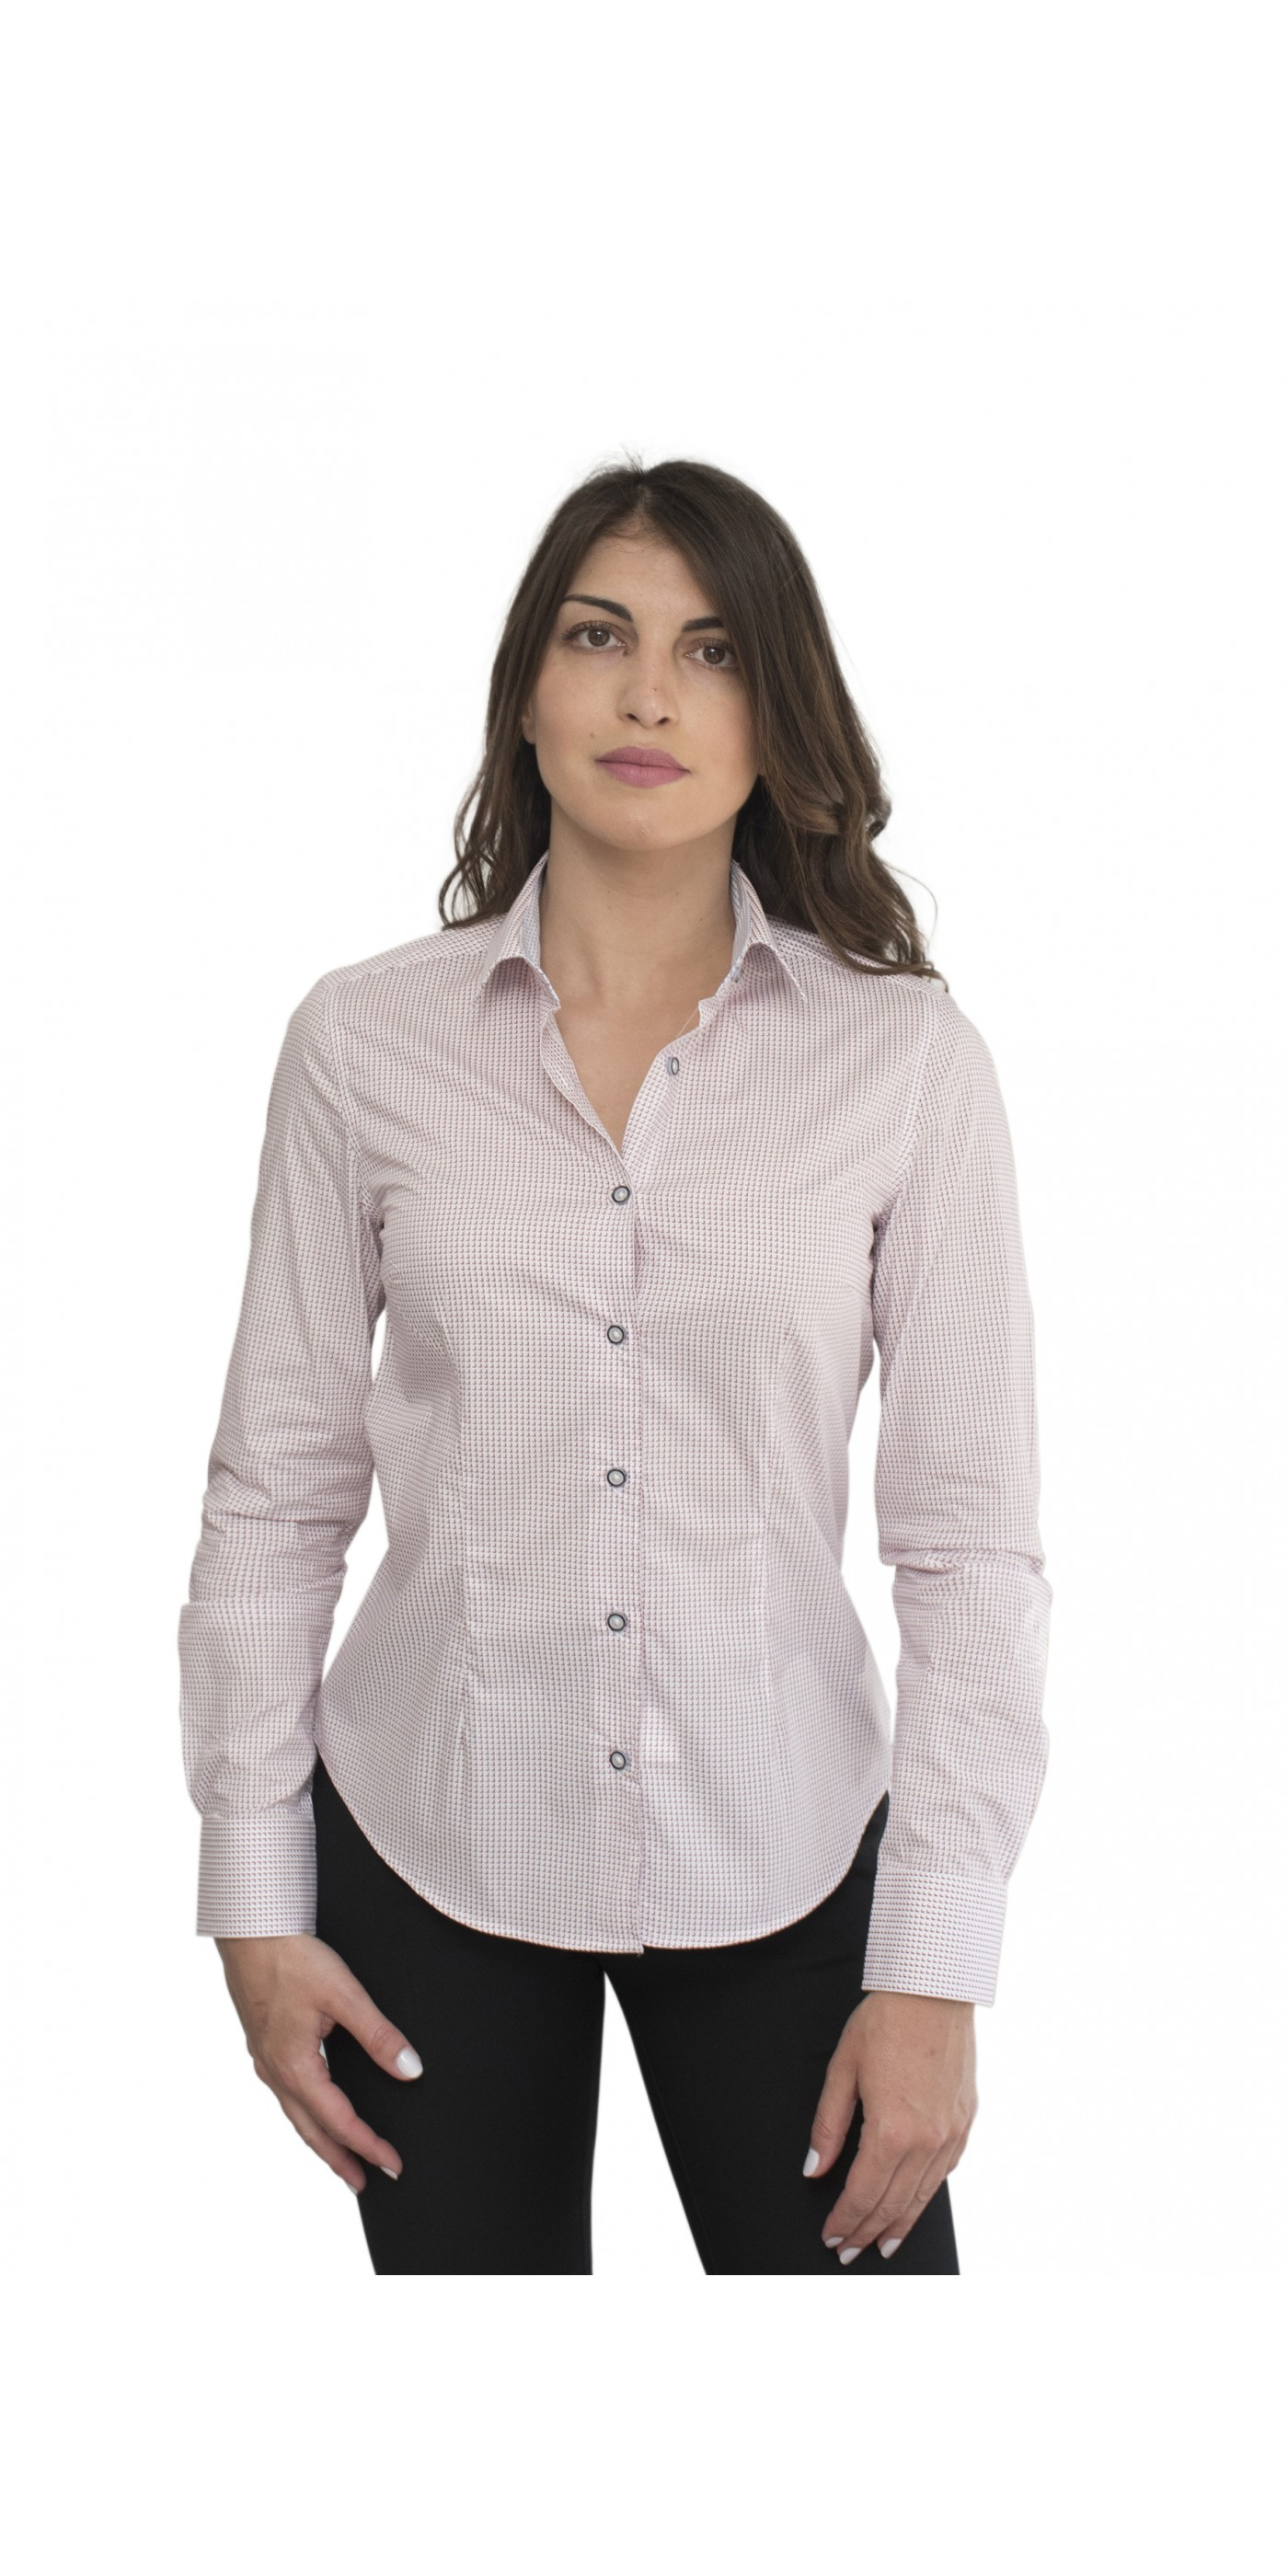 d32f2ff2bca2 Λευκό γυναικείο πουκάμισο με κόκκινα μοτίβα